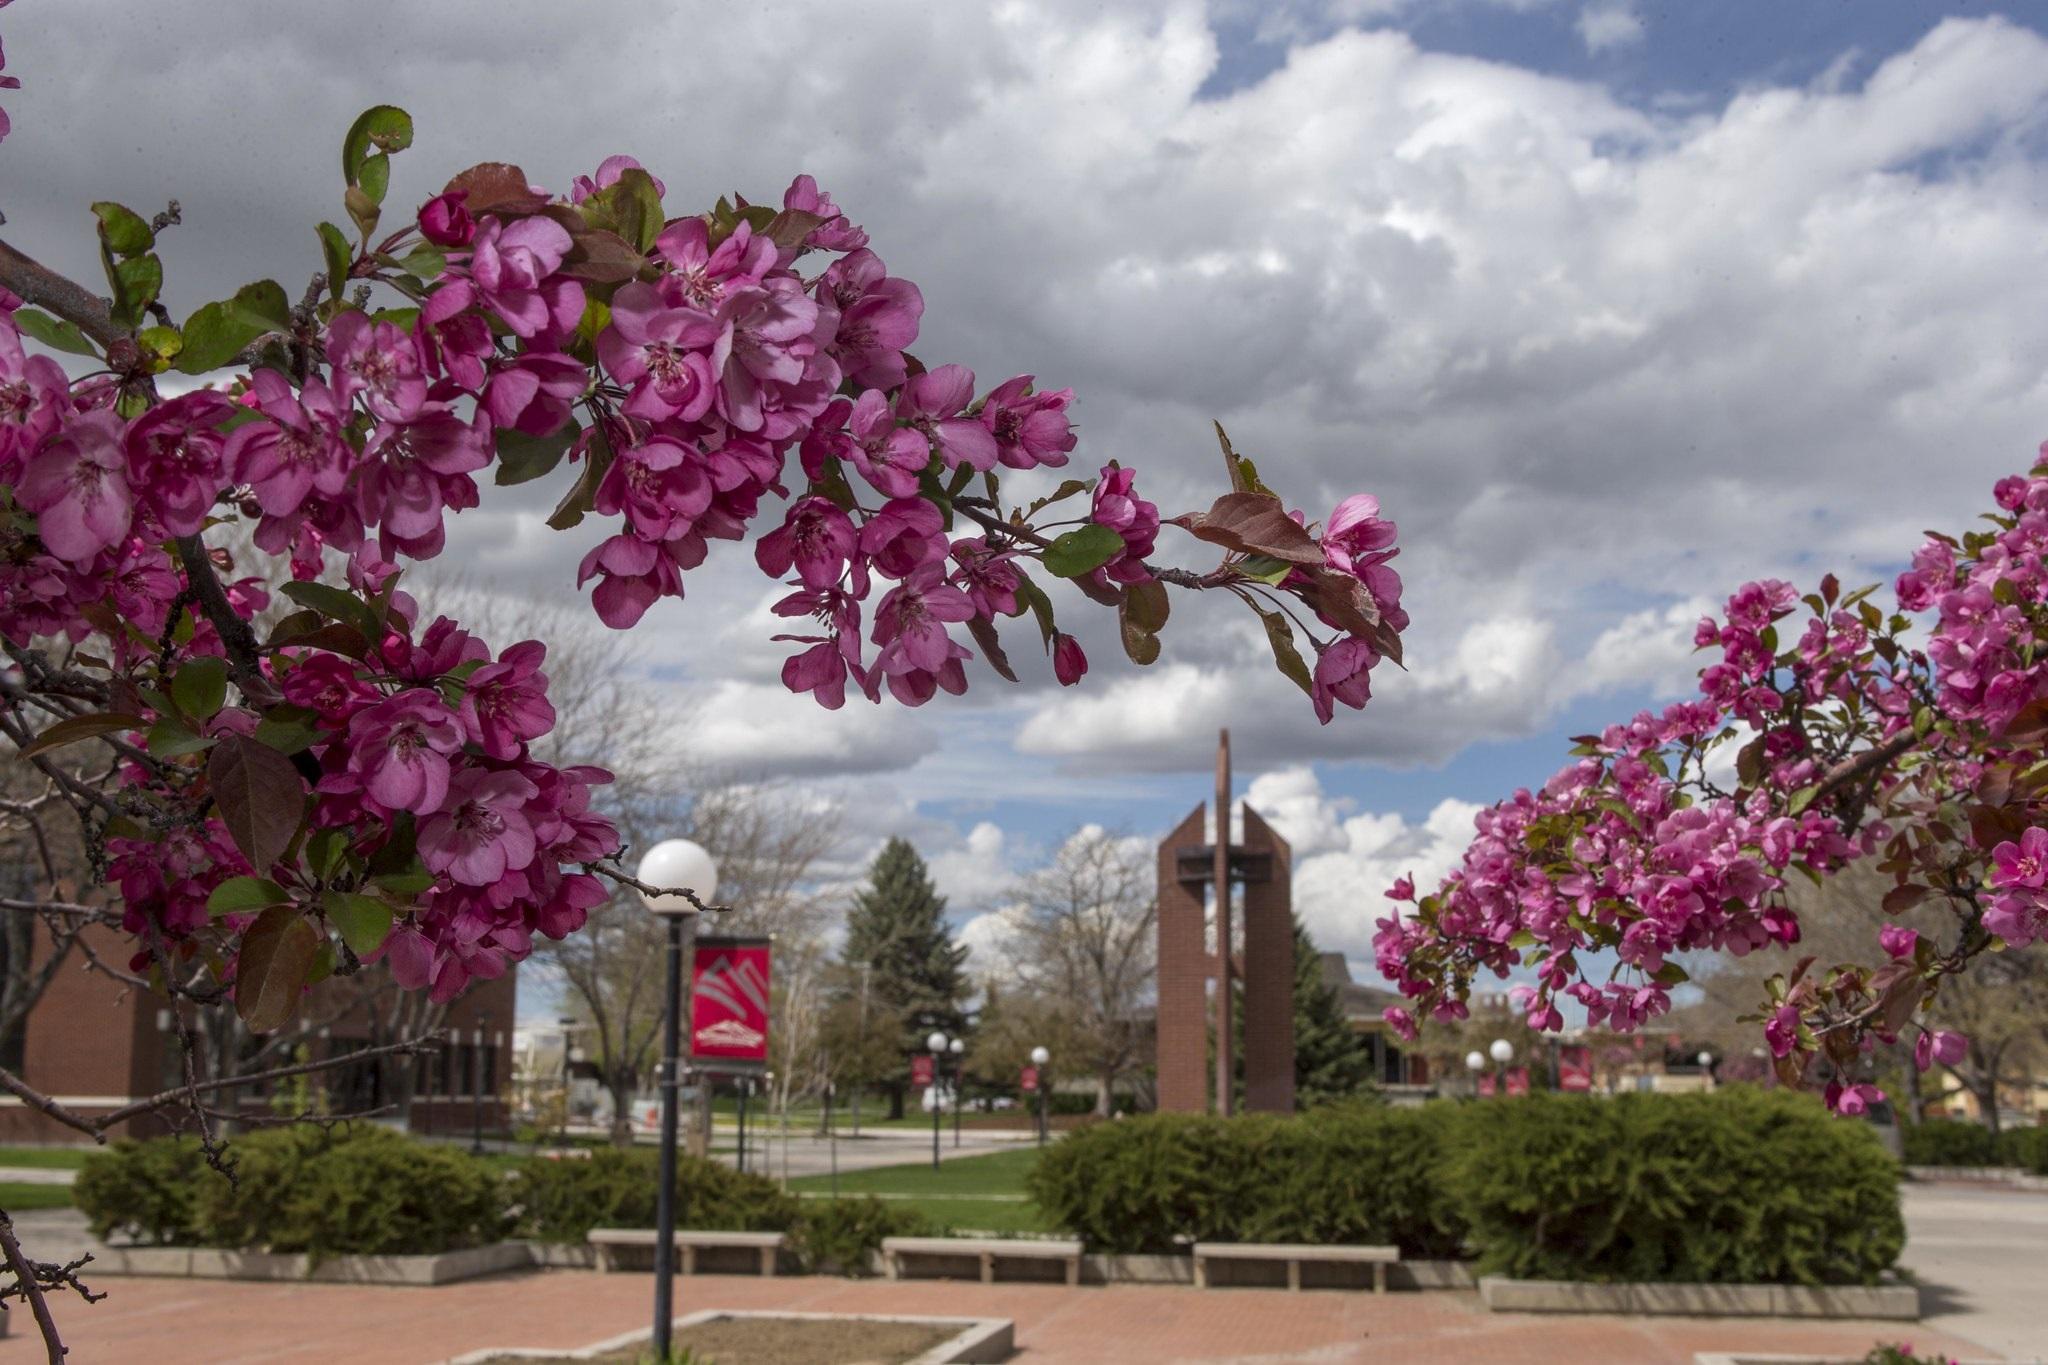 elm-pg-billboard-form Cherry blossoms large